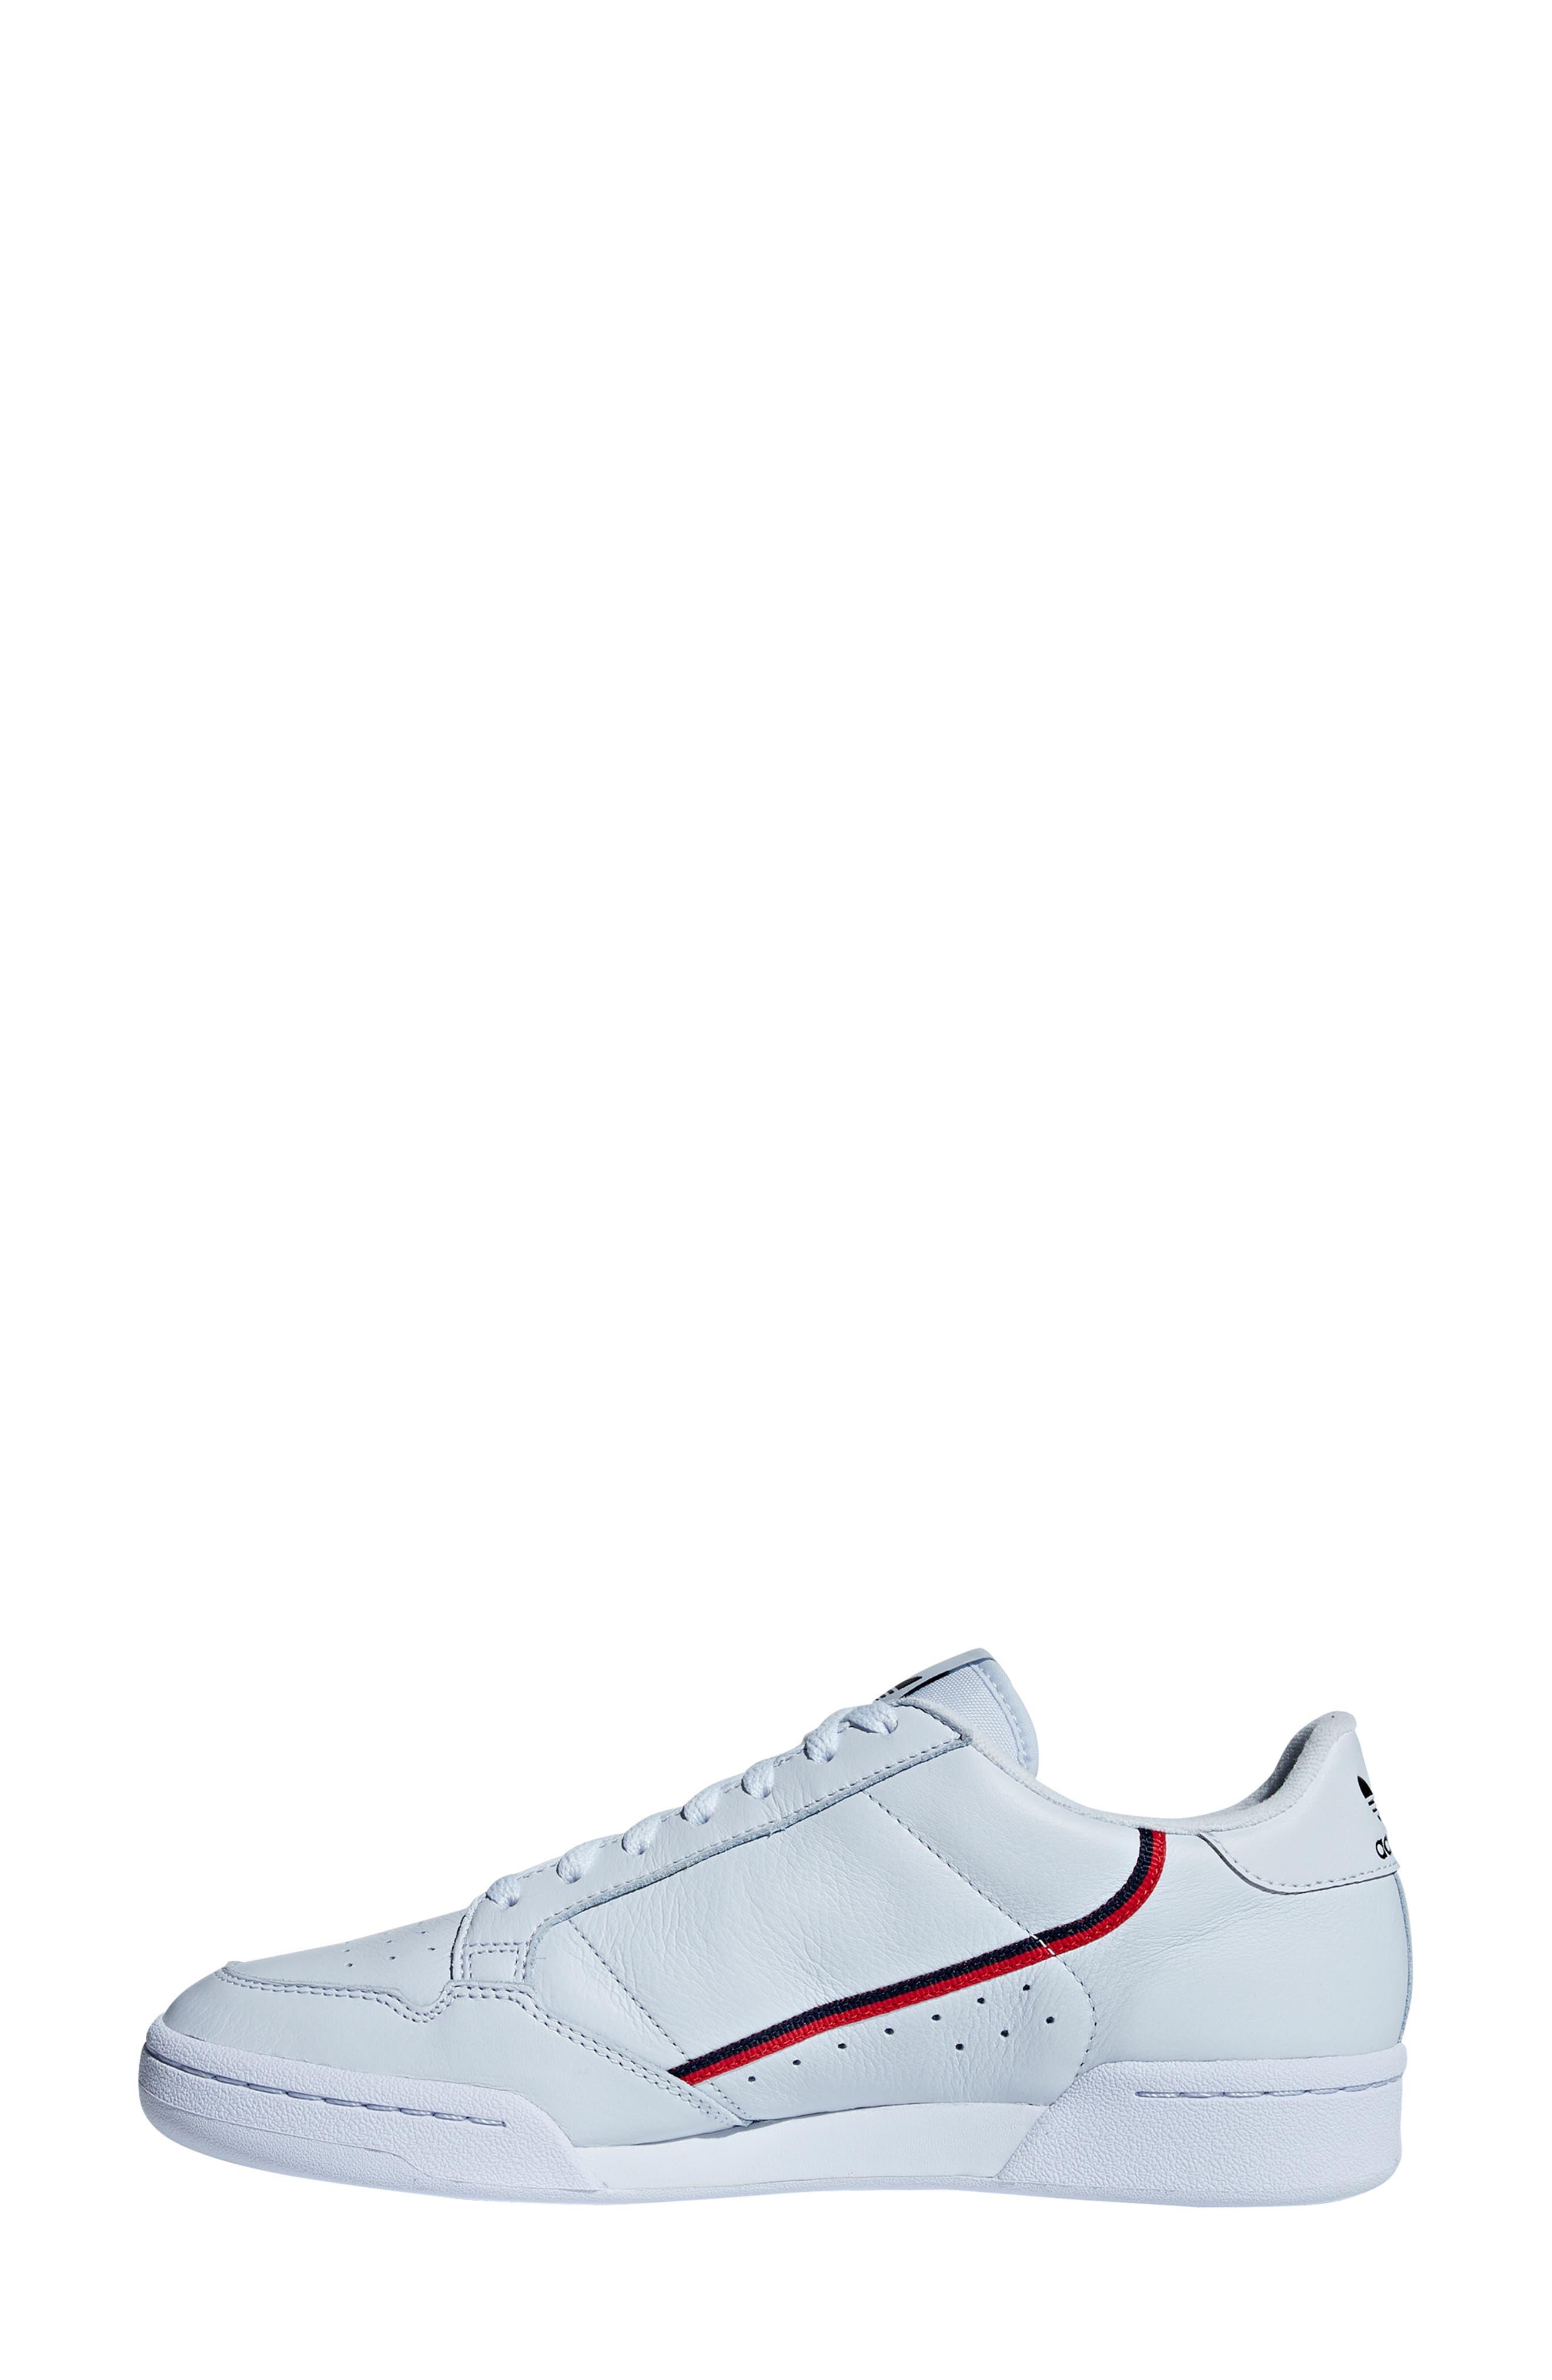 Continental 80 Sneaker,                             Alternate thumbnail 10, color,                             AERO BLUE/ SCARLET/ NAVY